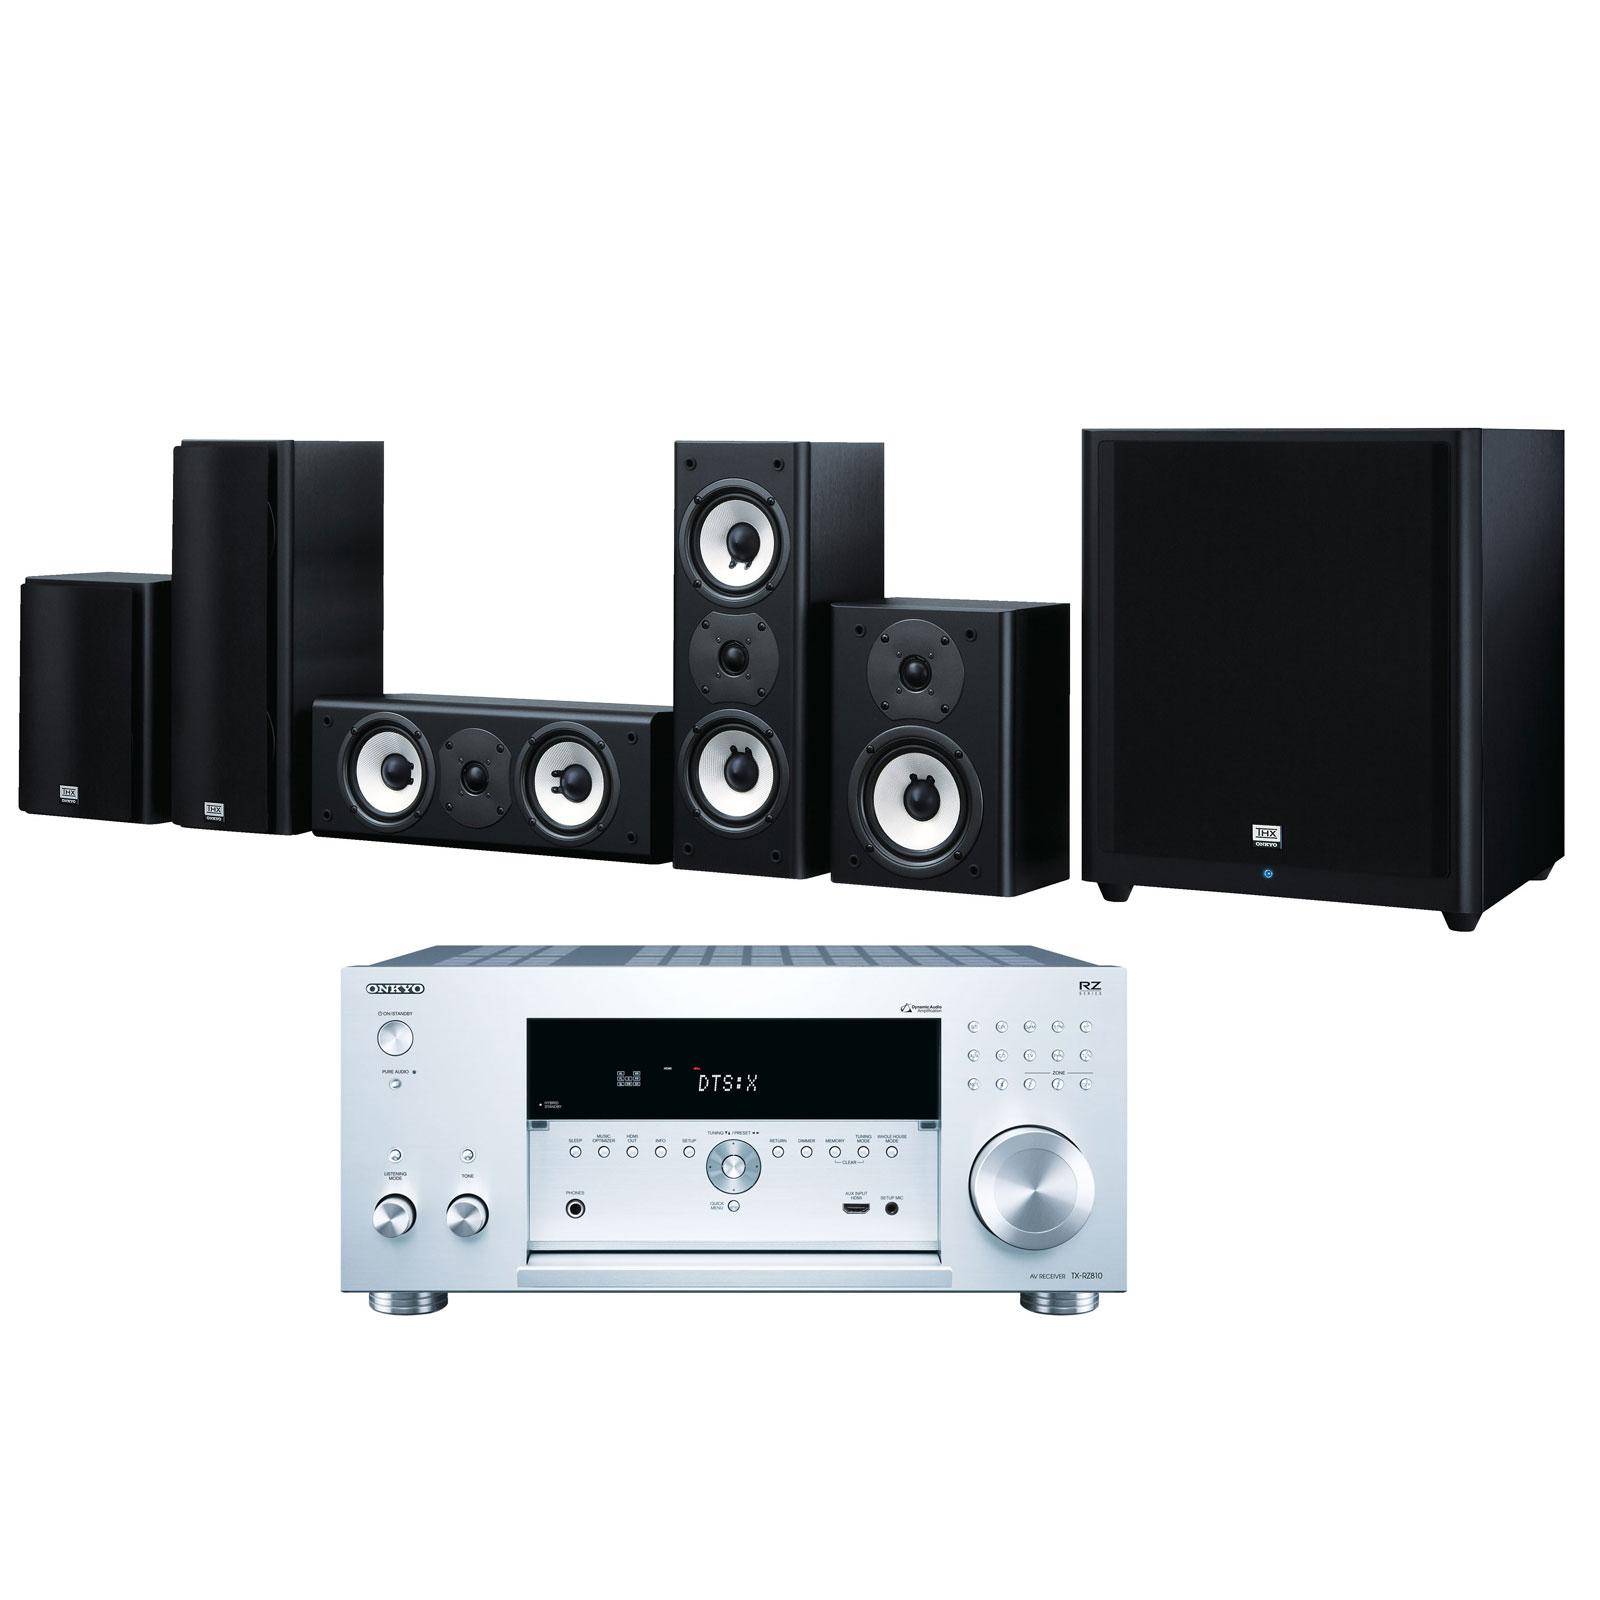 Ensemble home cinéma Onkyo TX-RZ810 Argent + SKS-HT978THX Ampli-tuner Home Cinéma 7.2 - THX - Bluetooth - AirPlay - Wi-Fi - Dolby Atmos - DTS:X - 4K - HDCP 2.2 - HDR - Hi-Res Audio - 8 entrées HDMI + Pack d'enceintes 5.1 certification THX